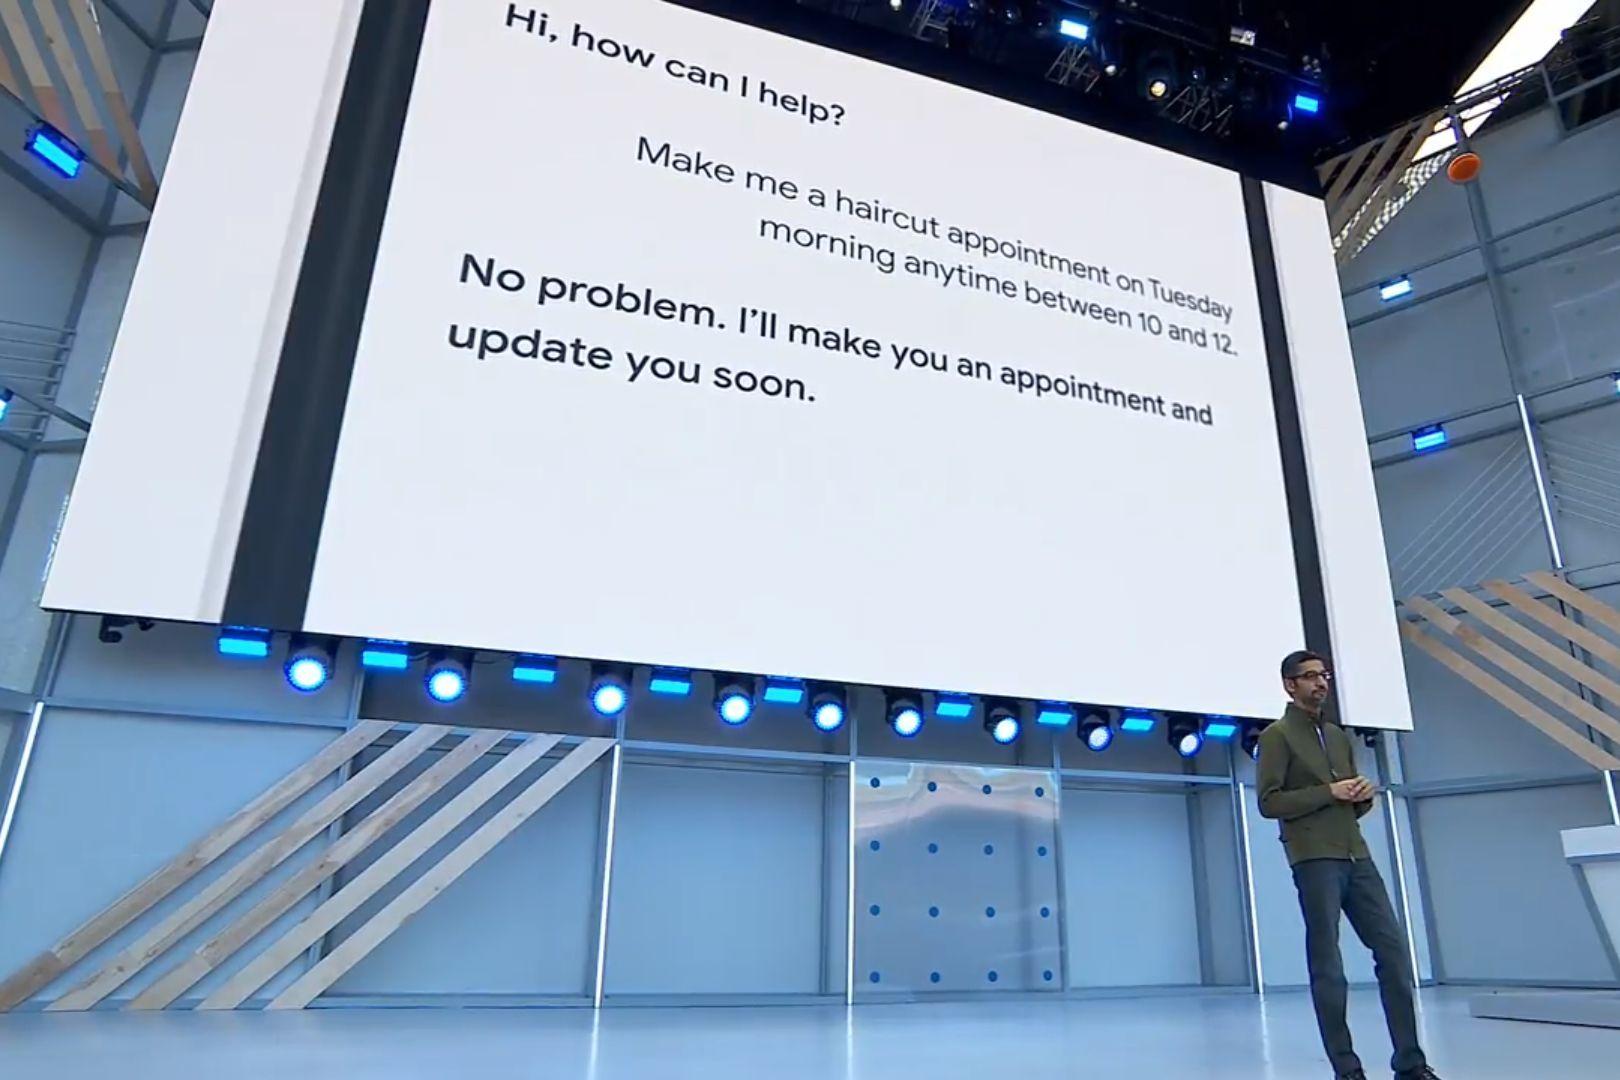 Google Asistent na Google I/O 2018